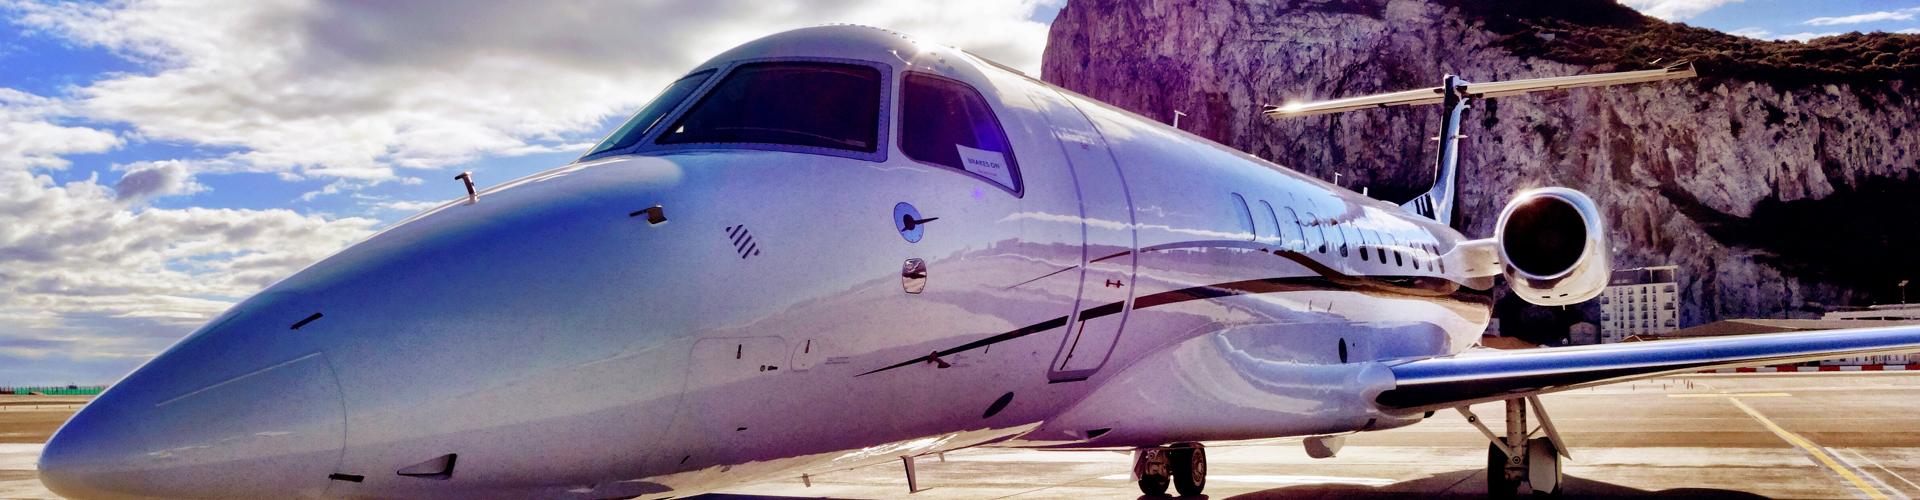 Avion affärsjet